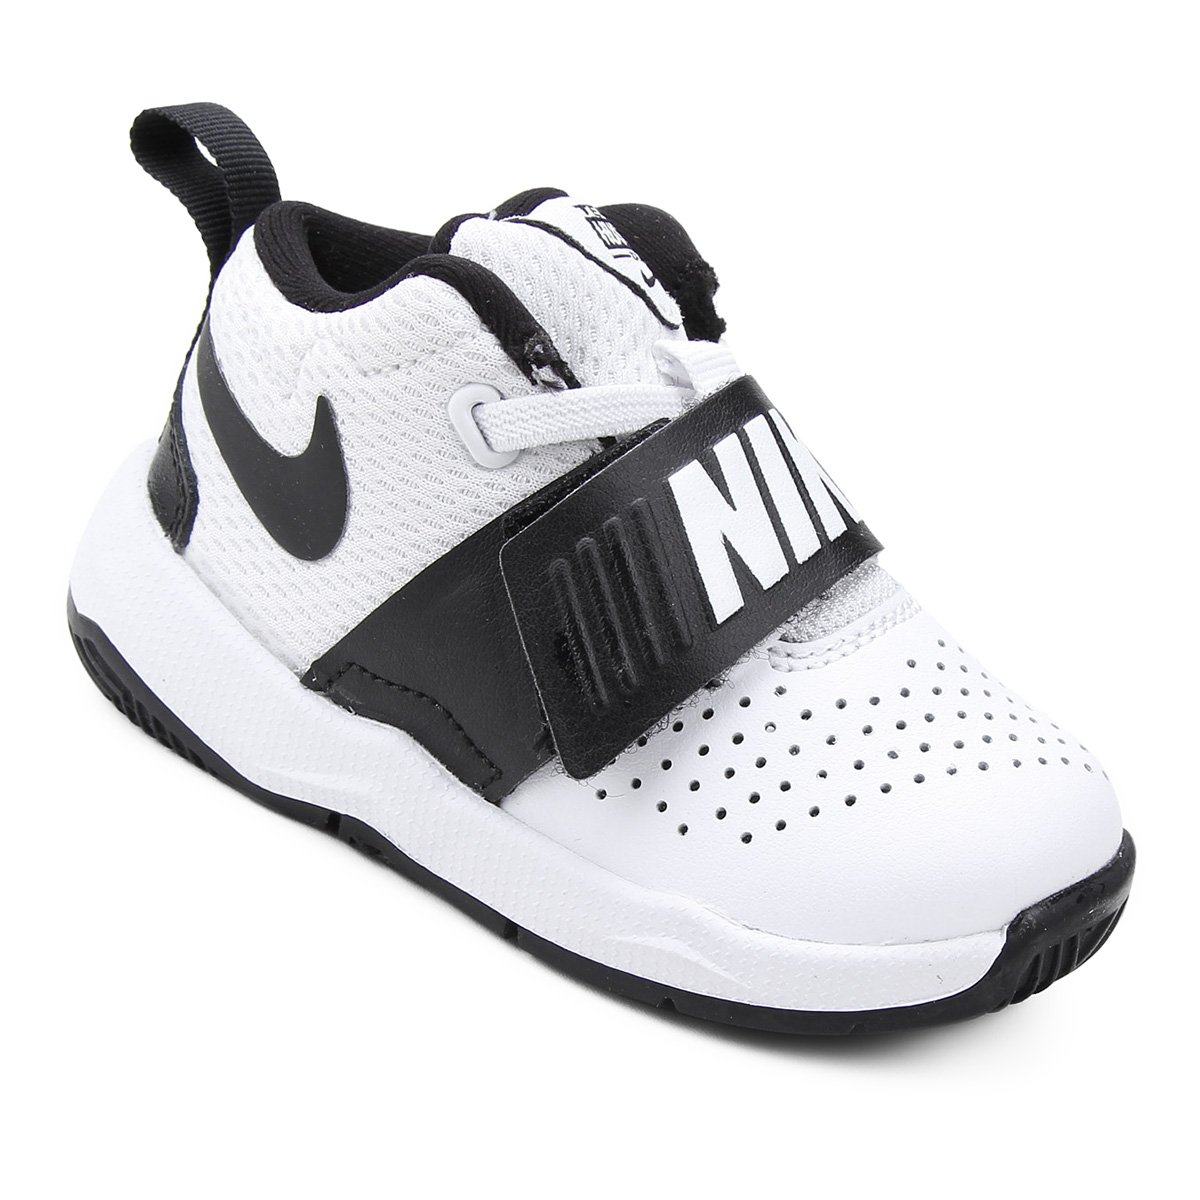 0d215ce29e9 Tênis Infantil Couro Nike Team Hustle D Masculino. undefined